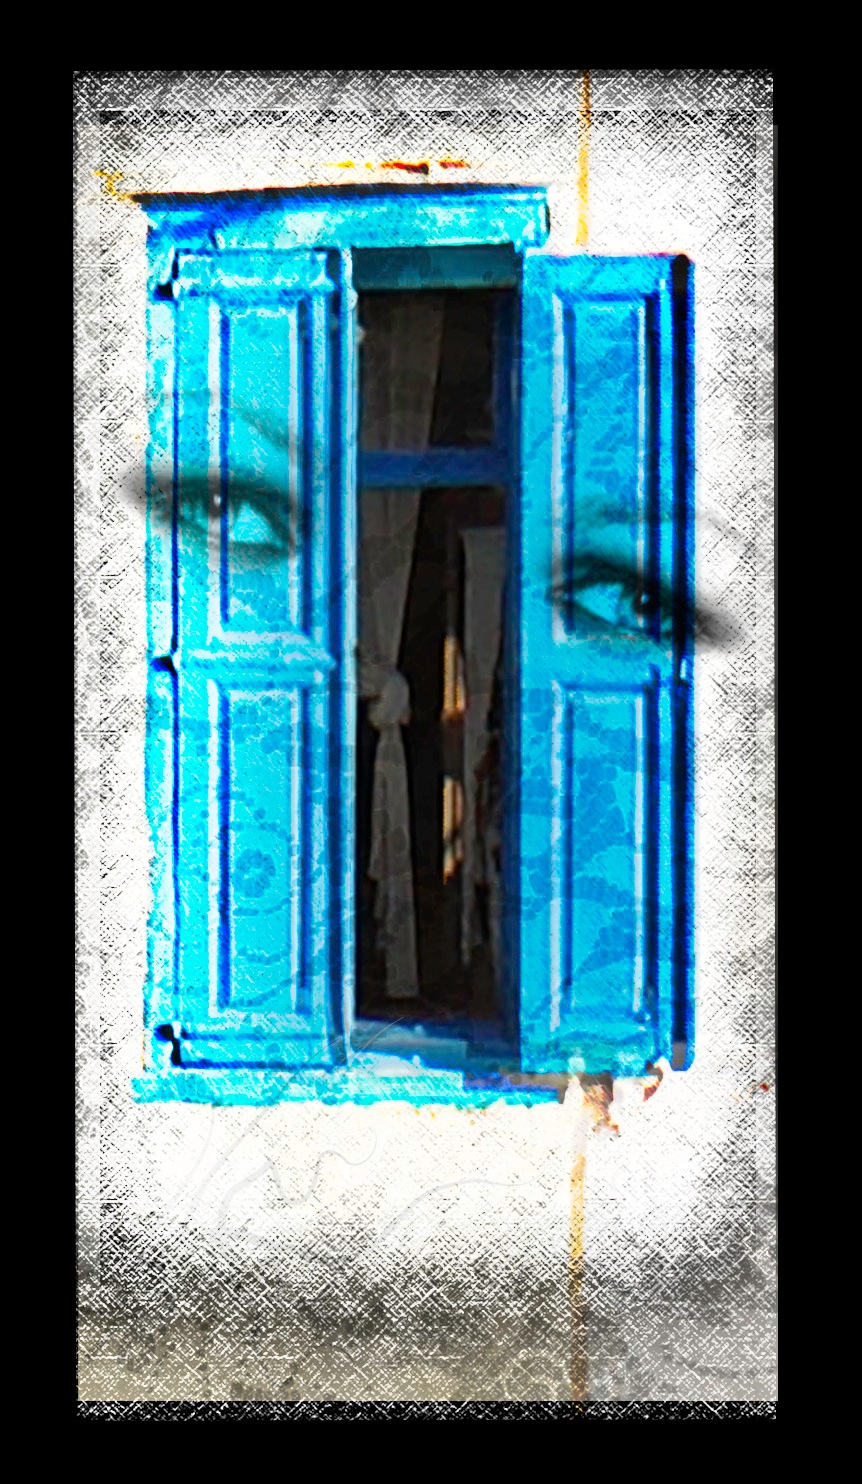 window, eyes, soul? by Lisa Booth